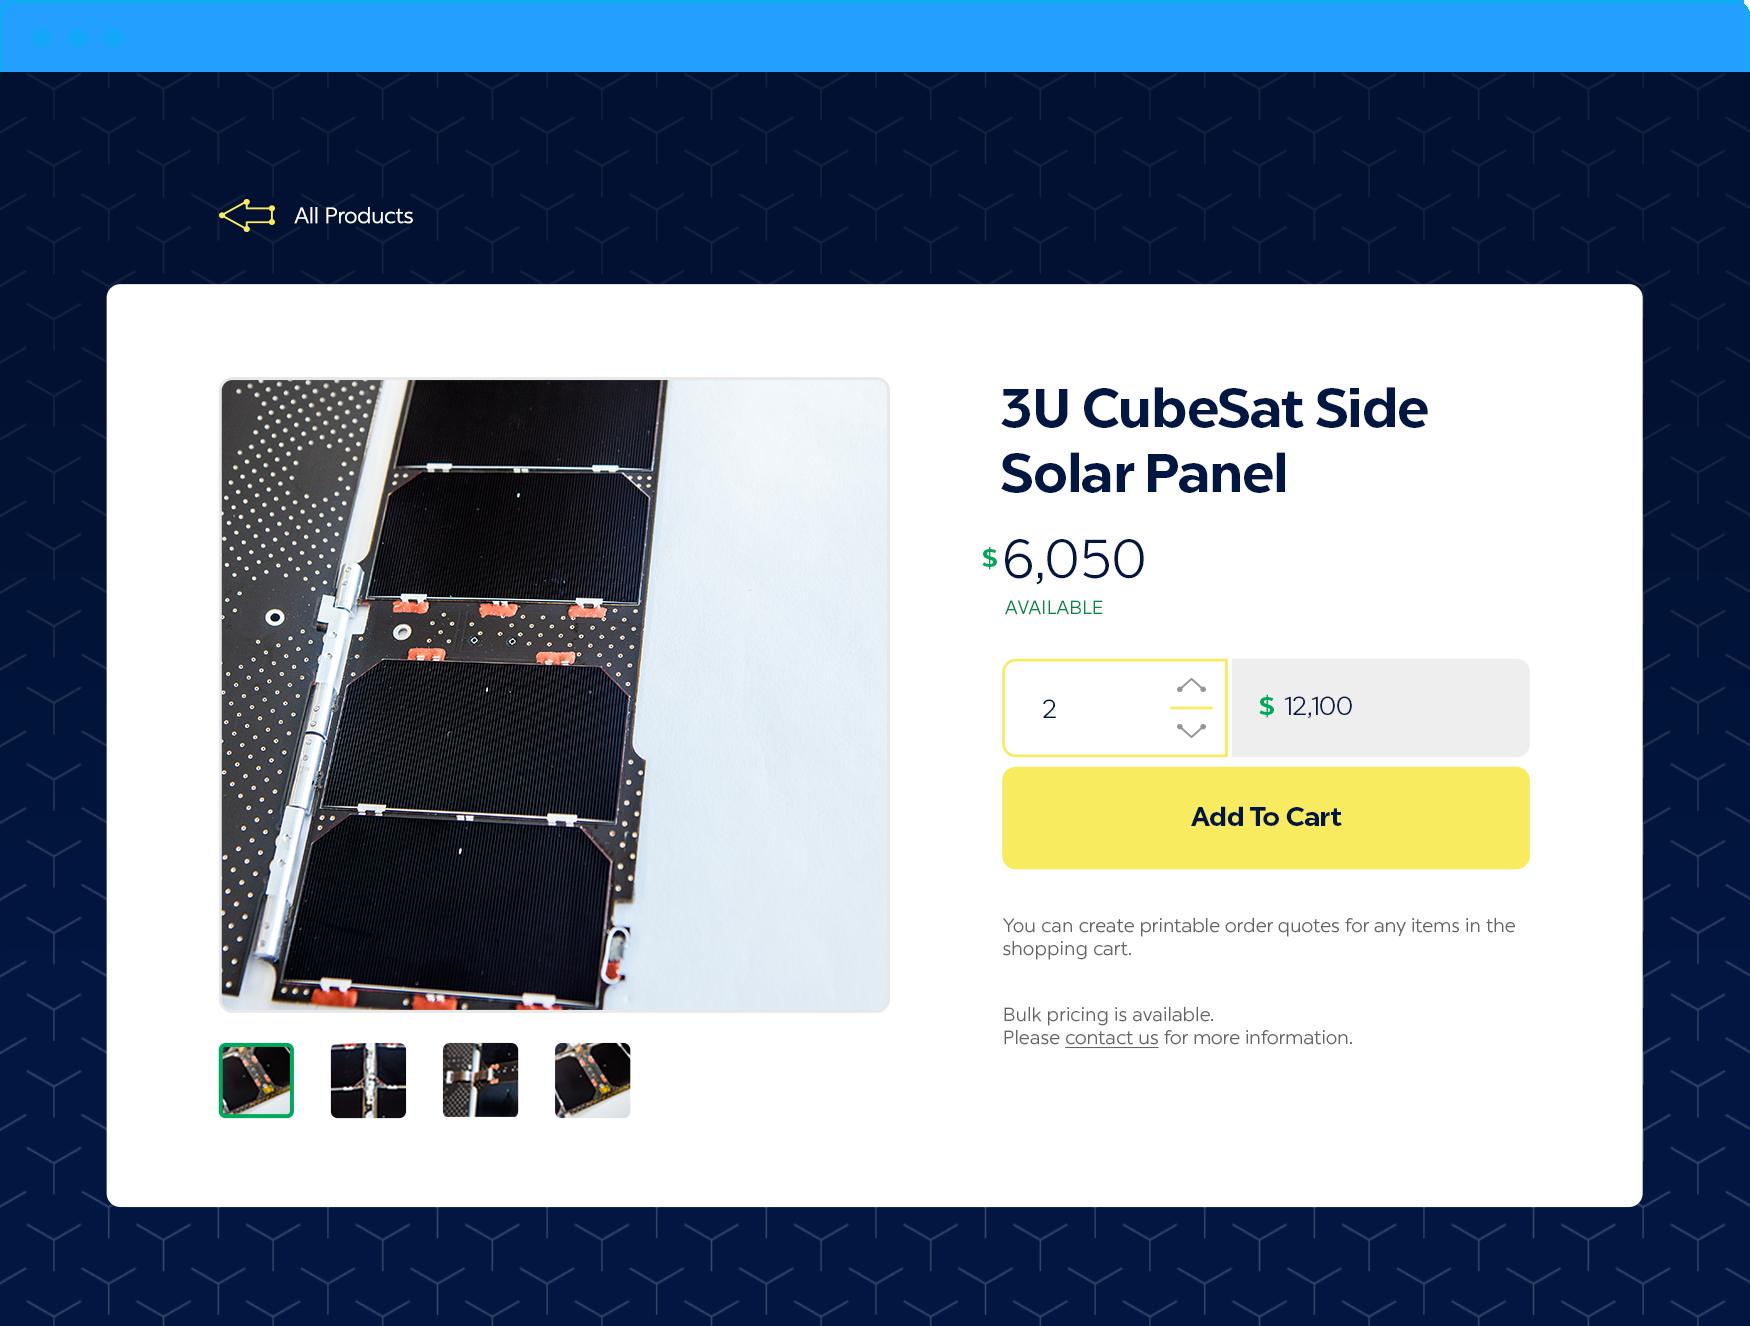 Clydespace-ProductDetail-Desktop.png